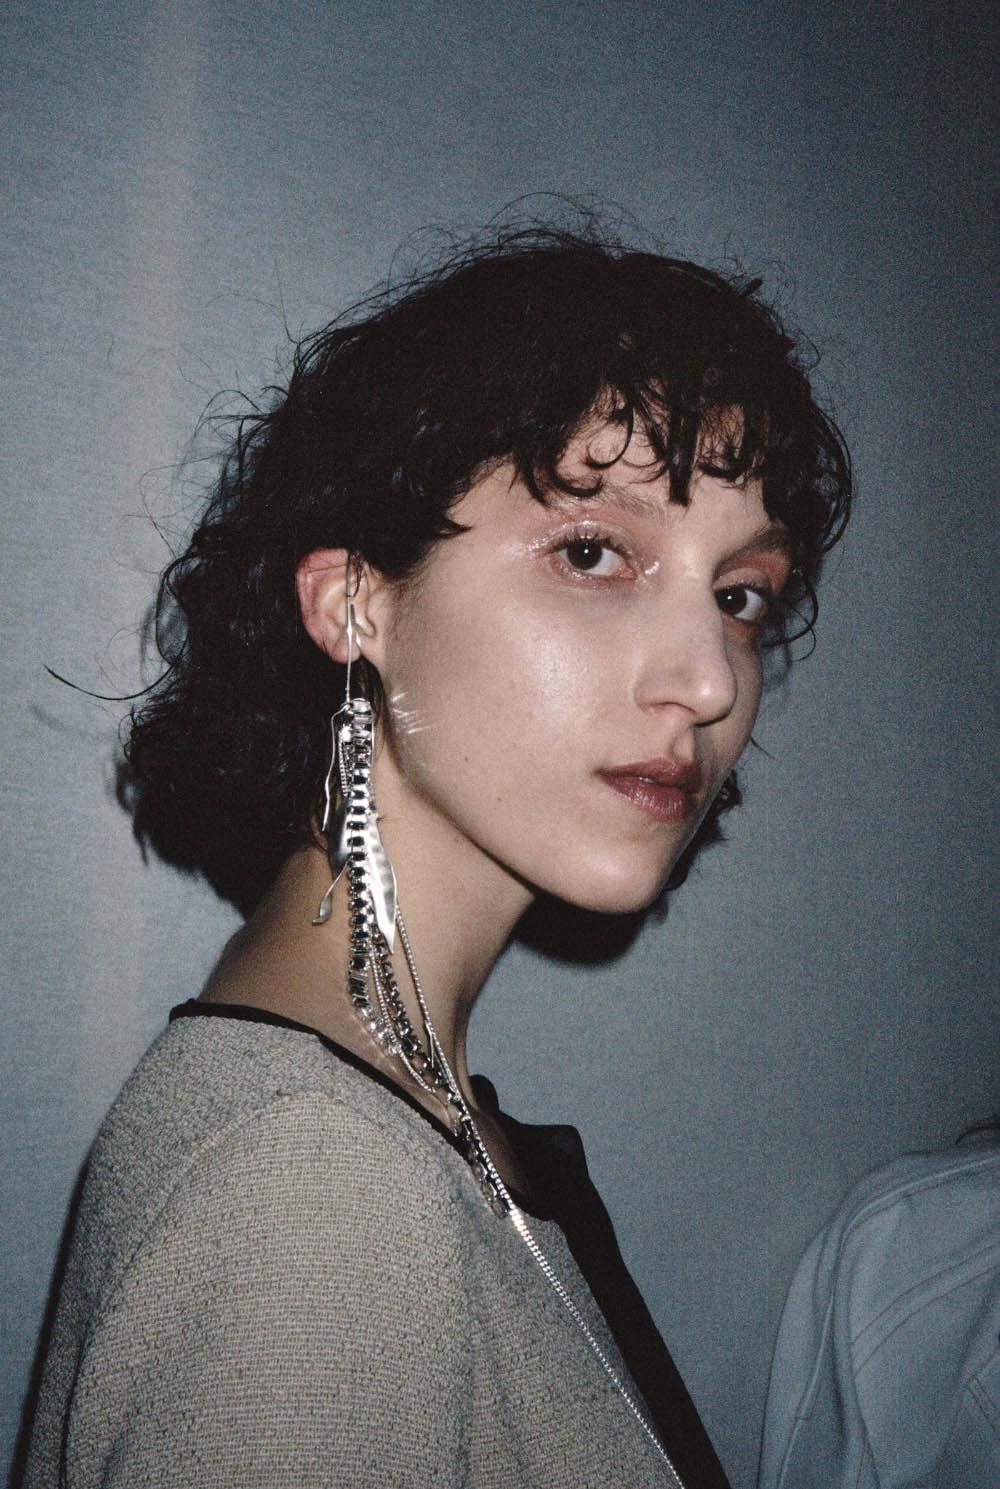 Ann-Sofie-Madsen-SS18-05.jpg